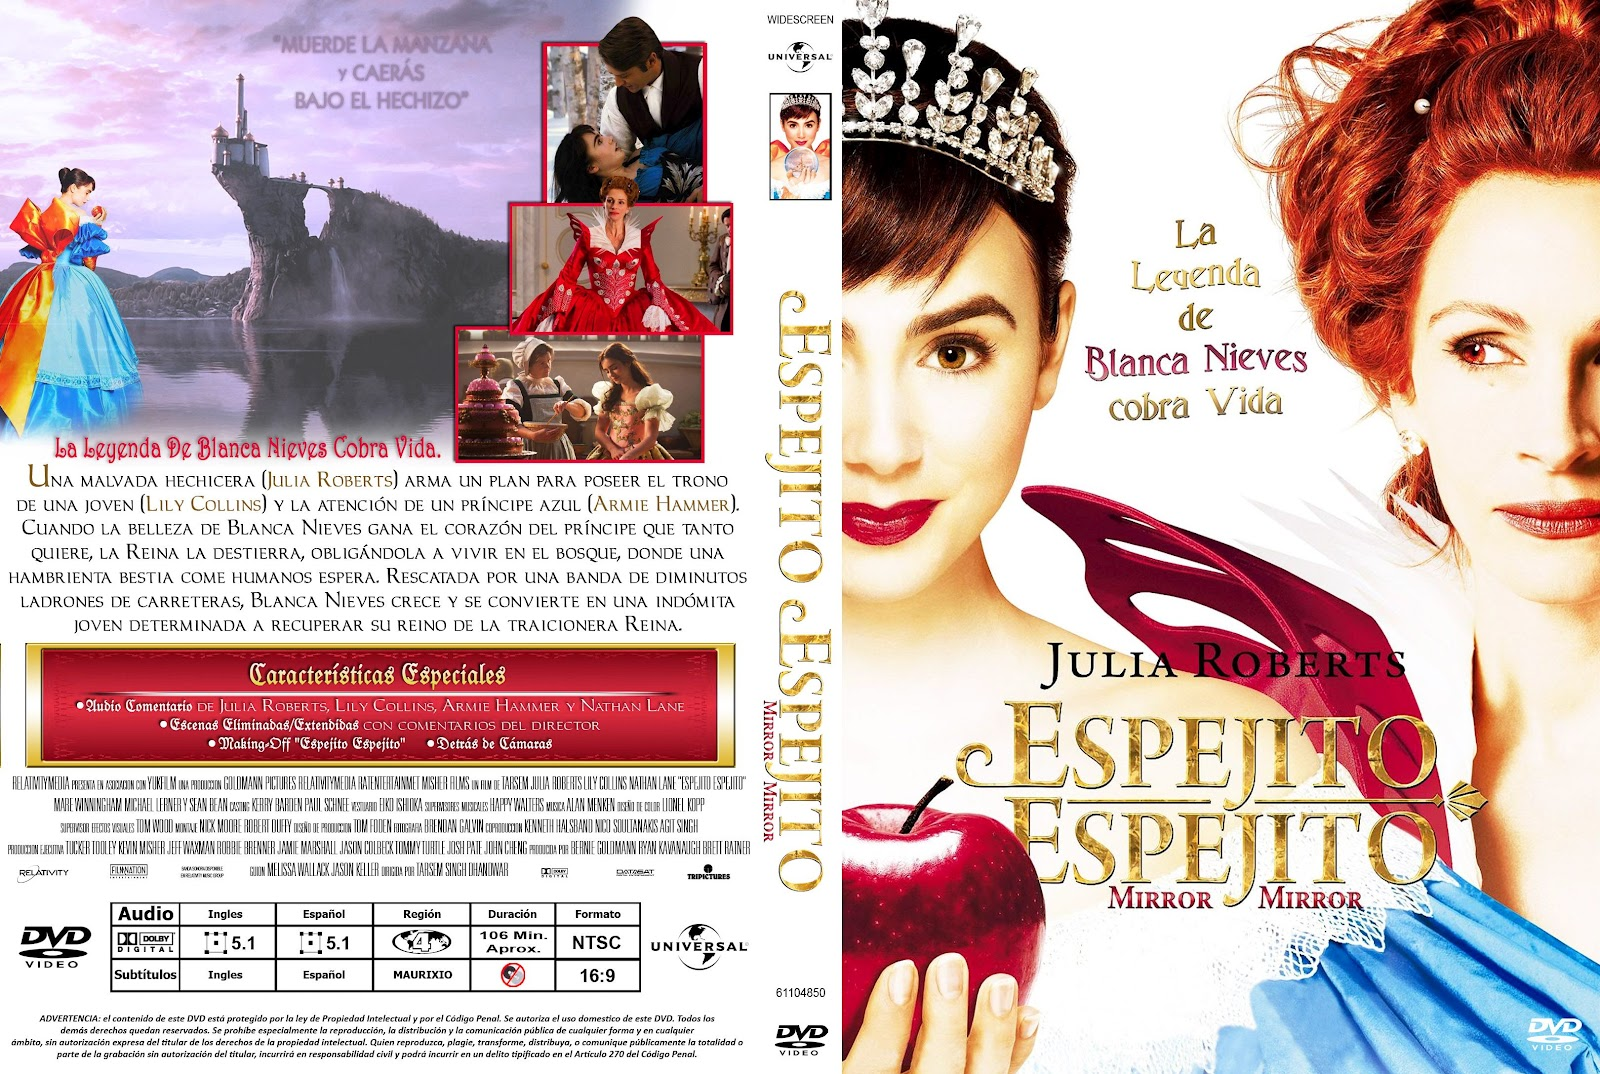 Peliculas dvd full espejito espejito mirror mirror for Espejito espejito